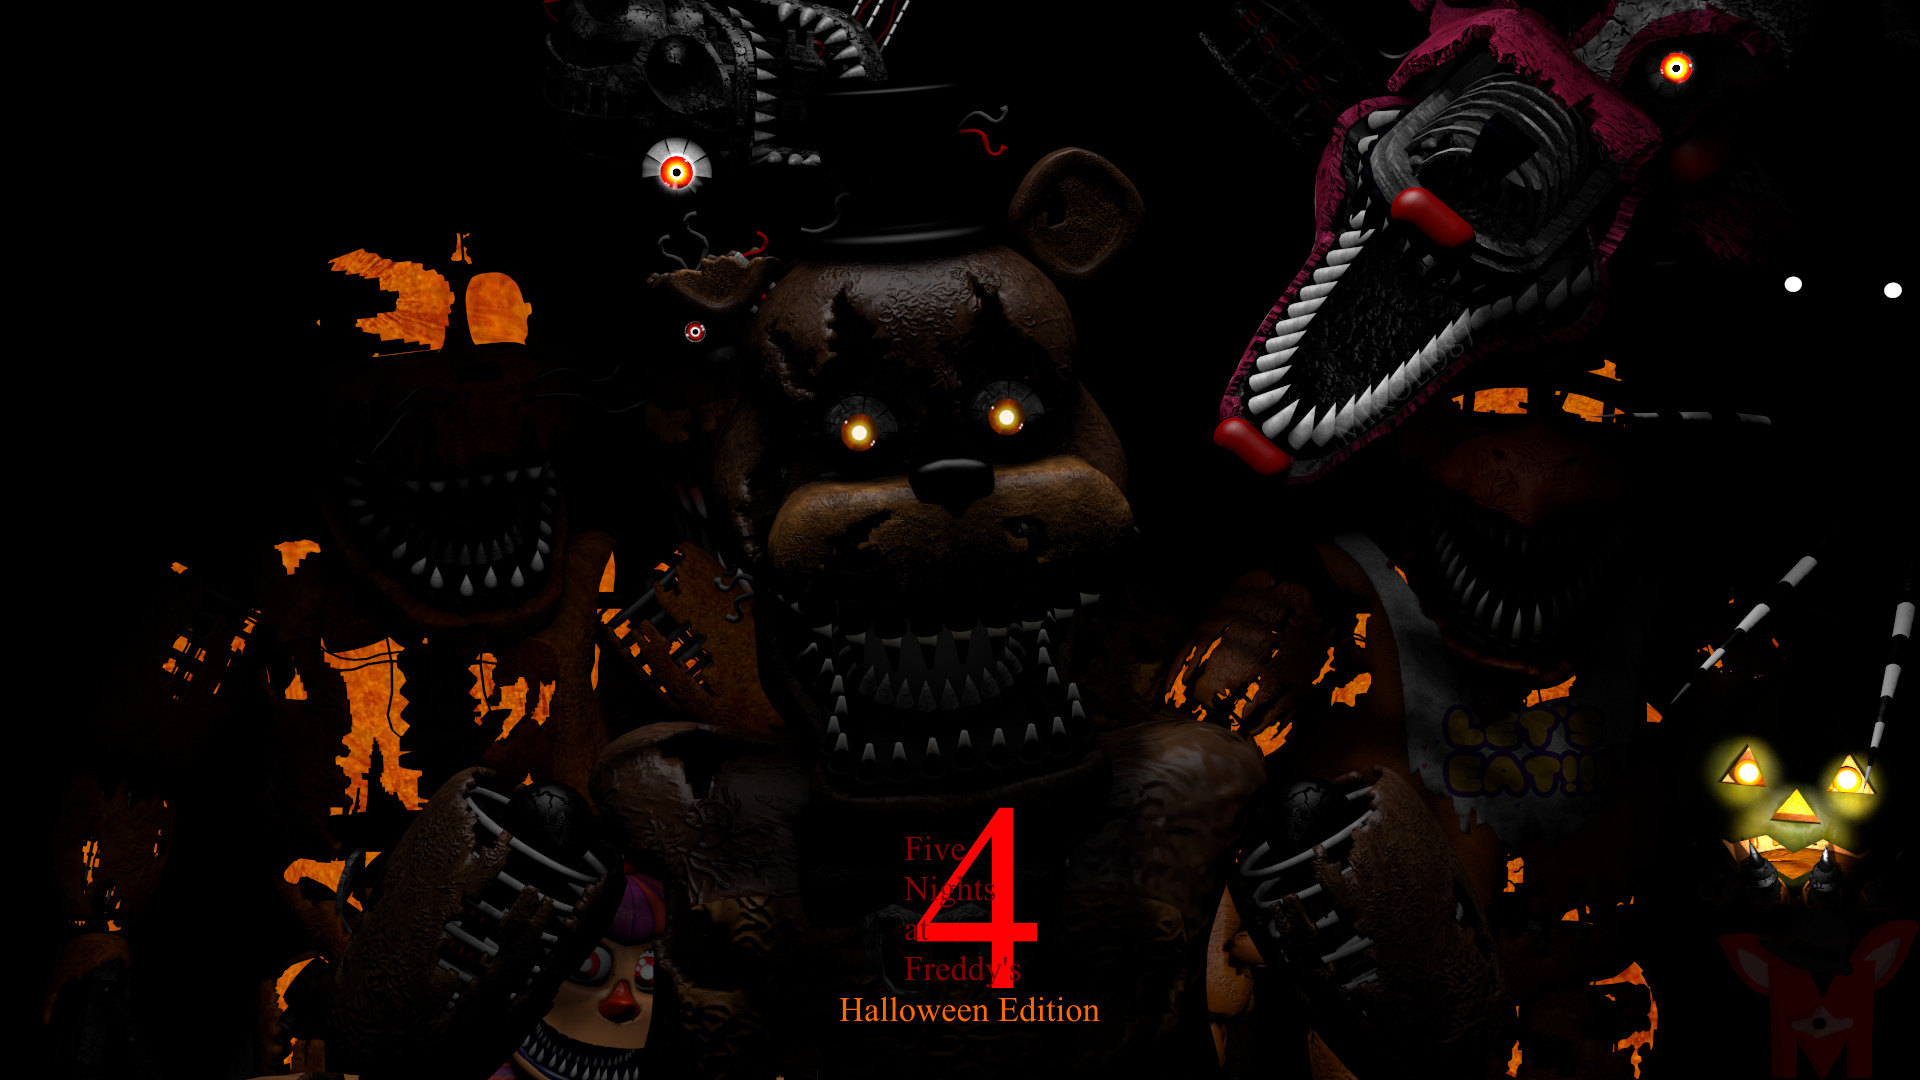 FNaF SFM: Five Nights At Freddy's 4 Halloween by Mikol1987 on .